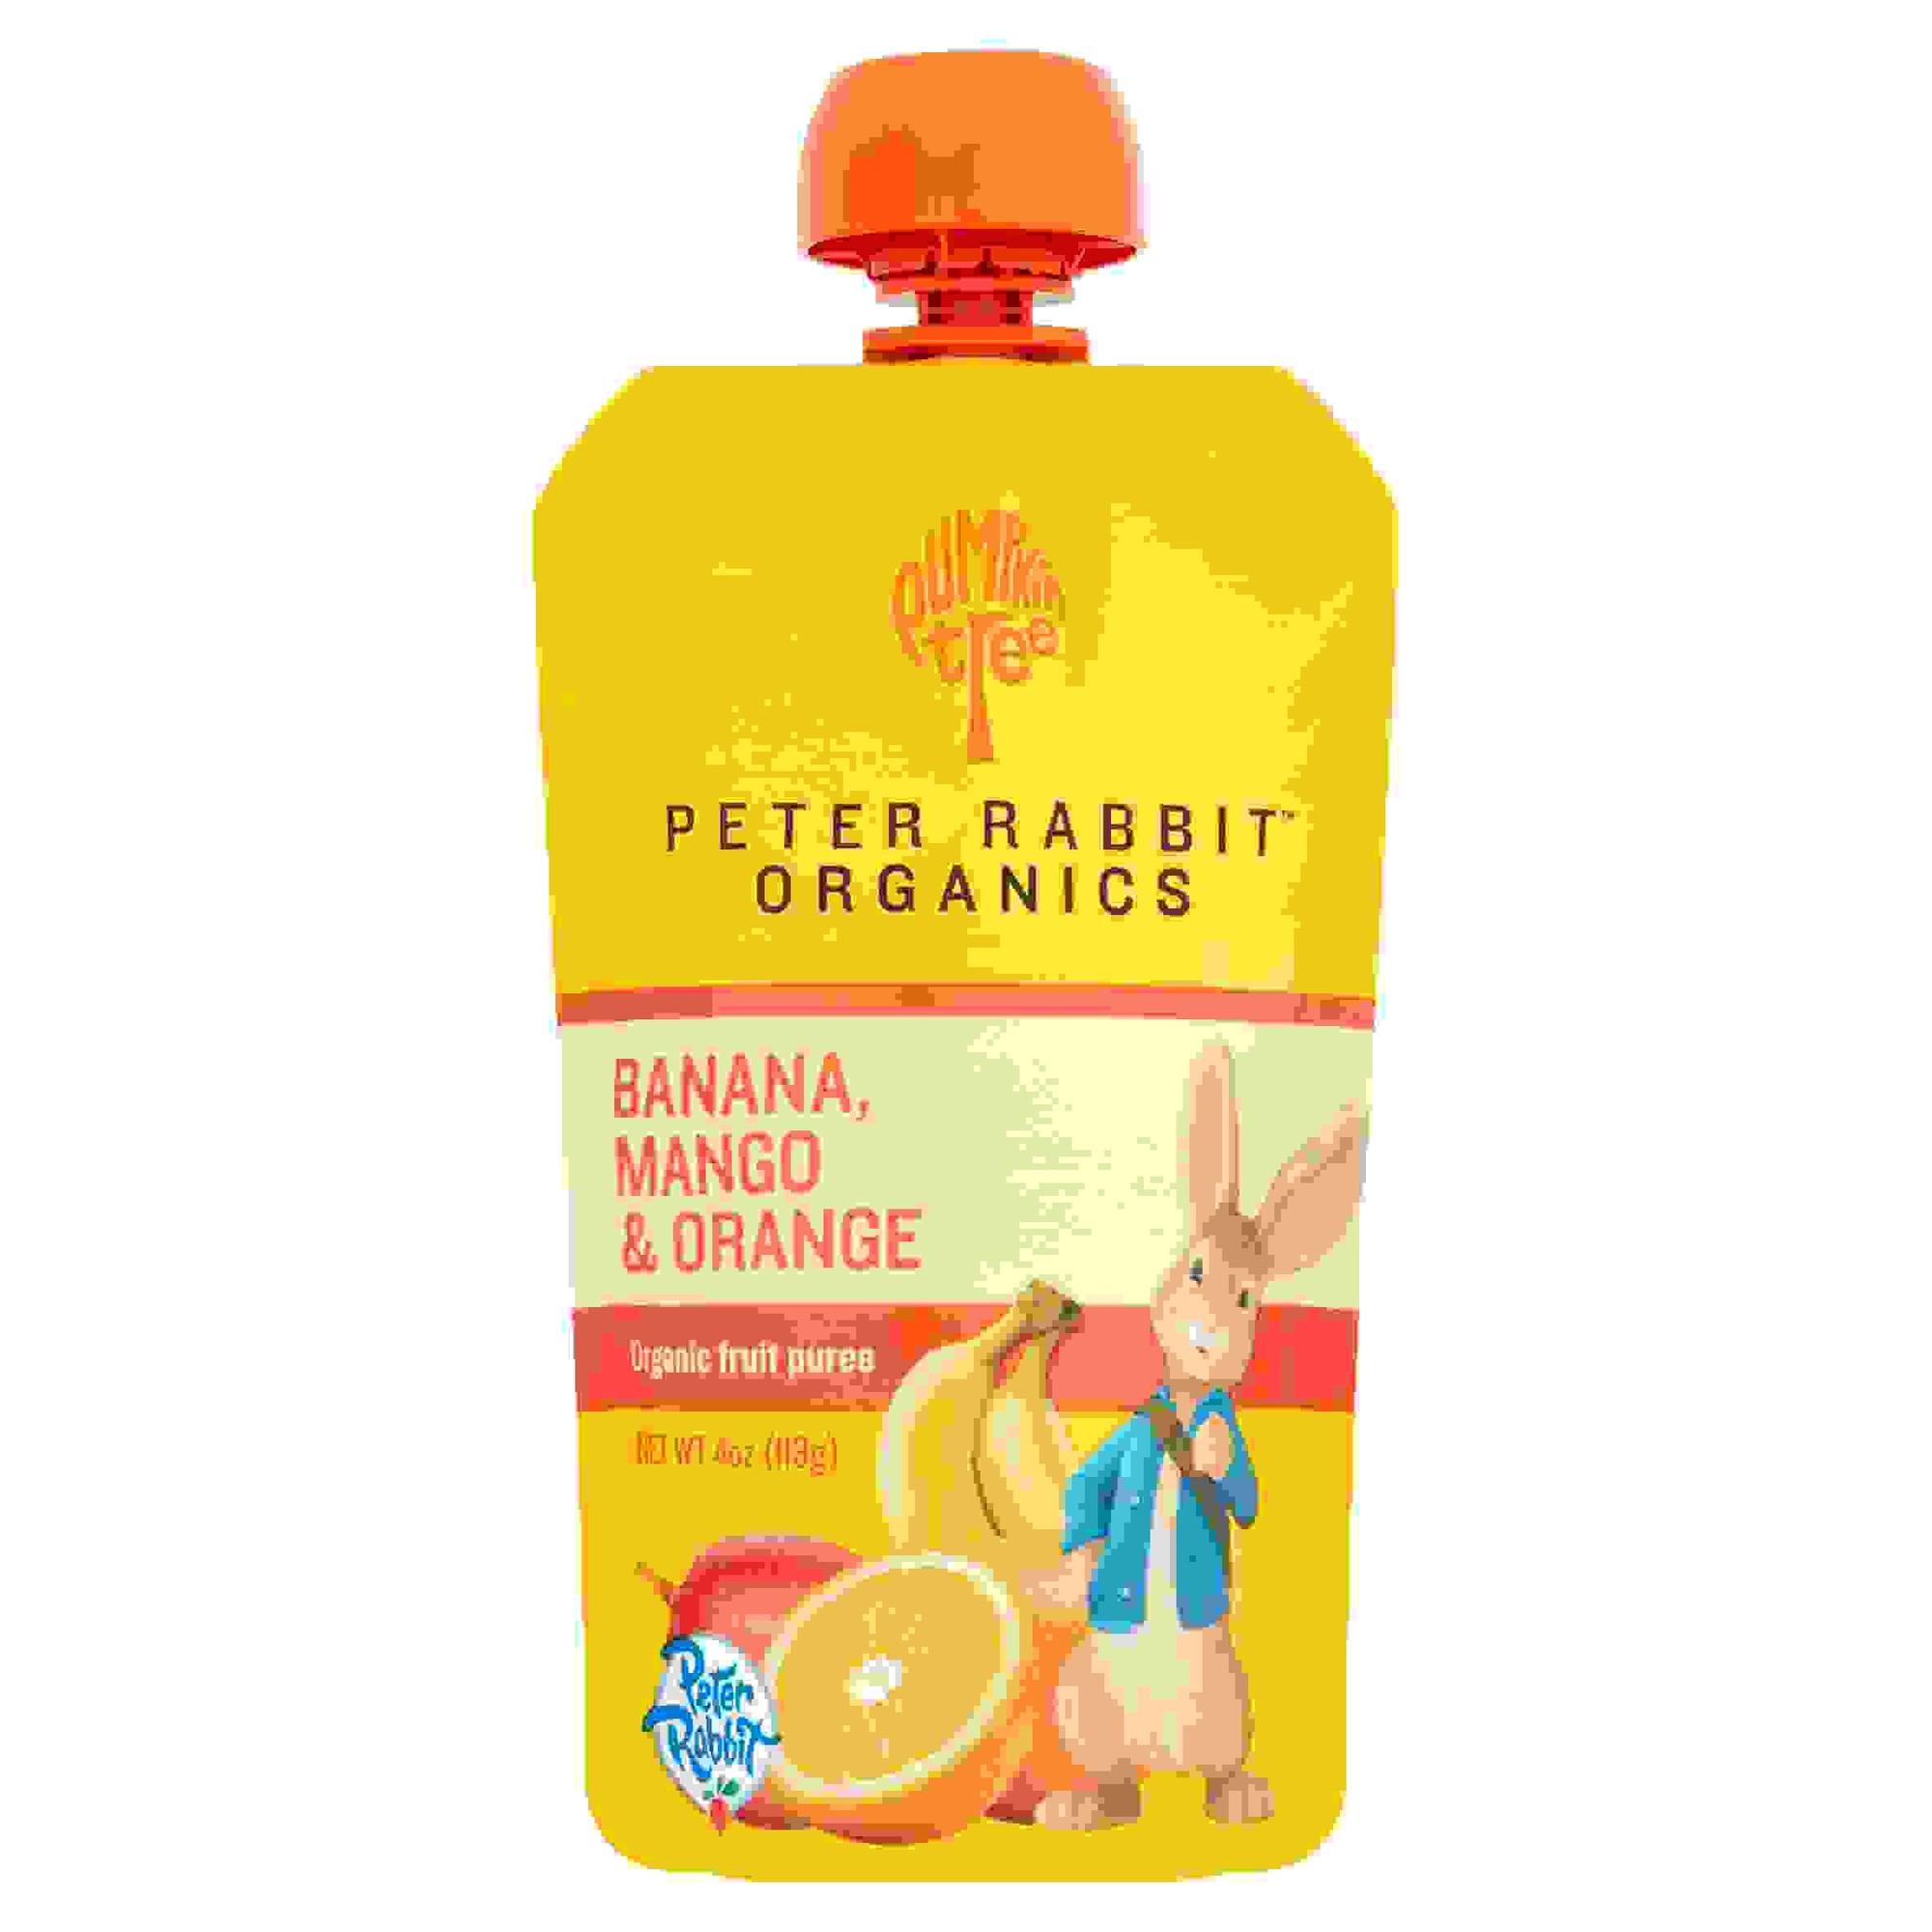 Peter Rabbit Organics Mango, Banana And Orange (10x4Oz)